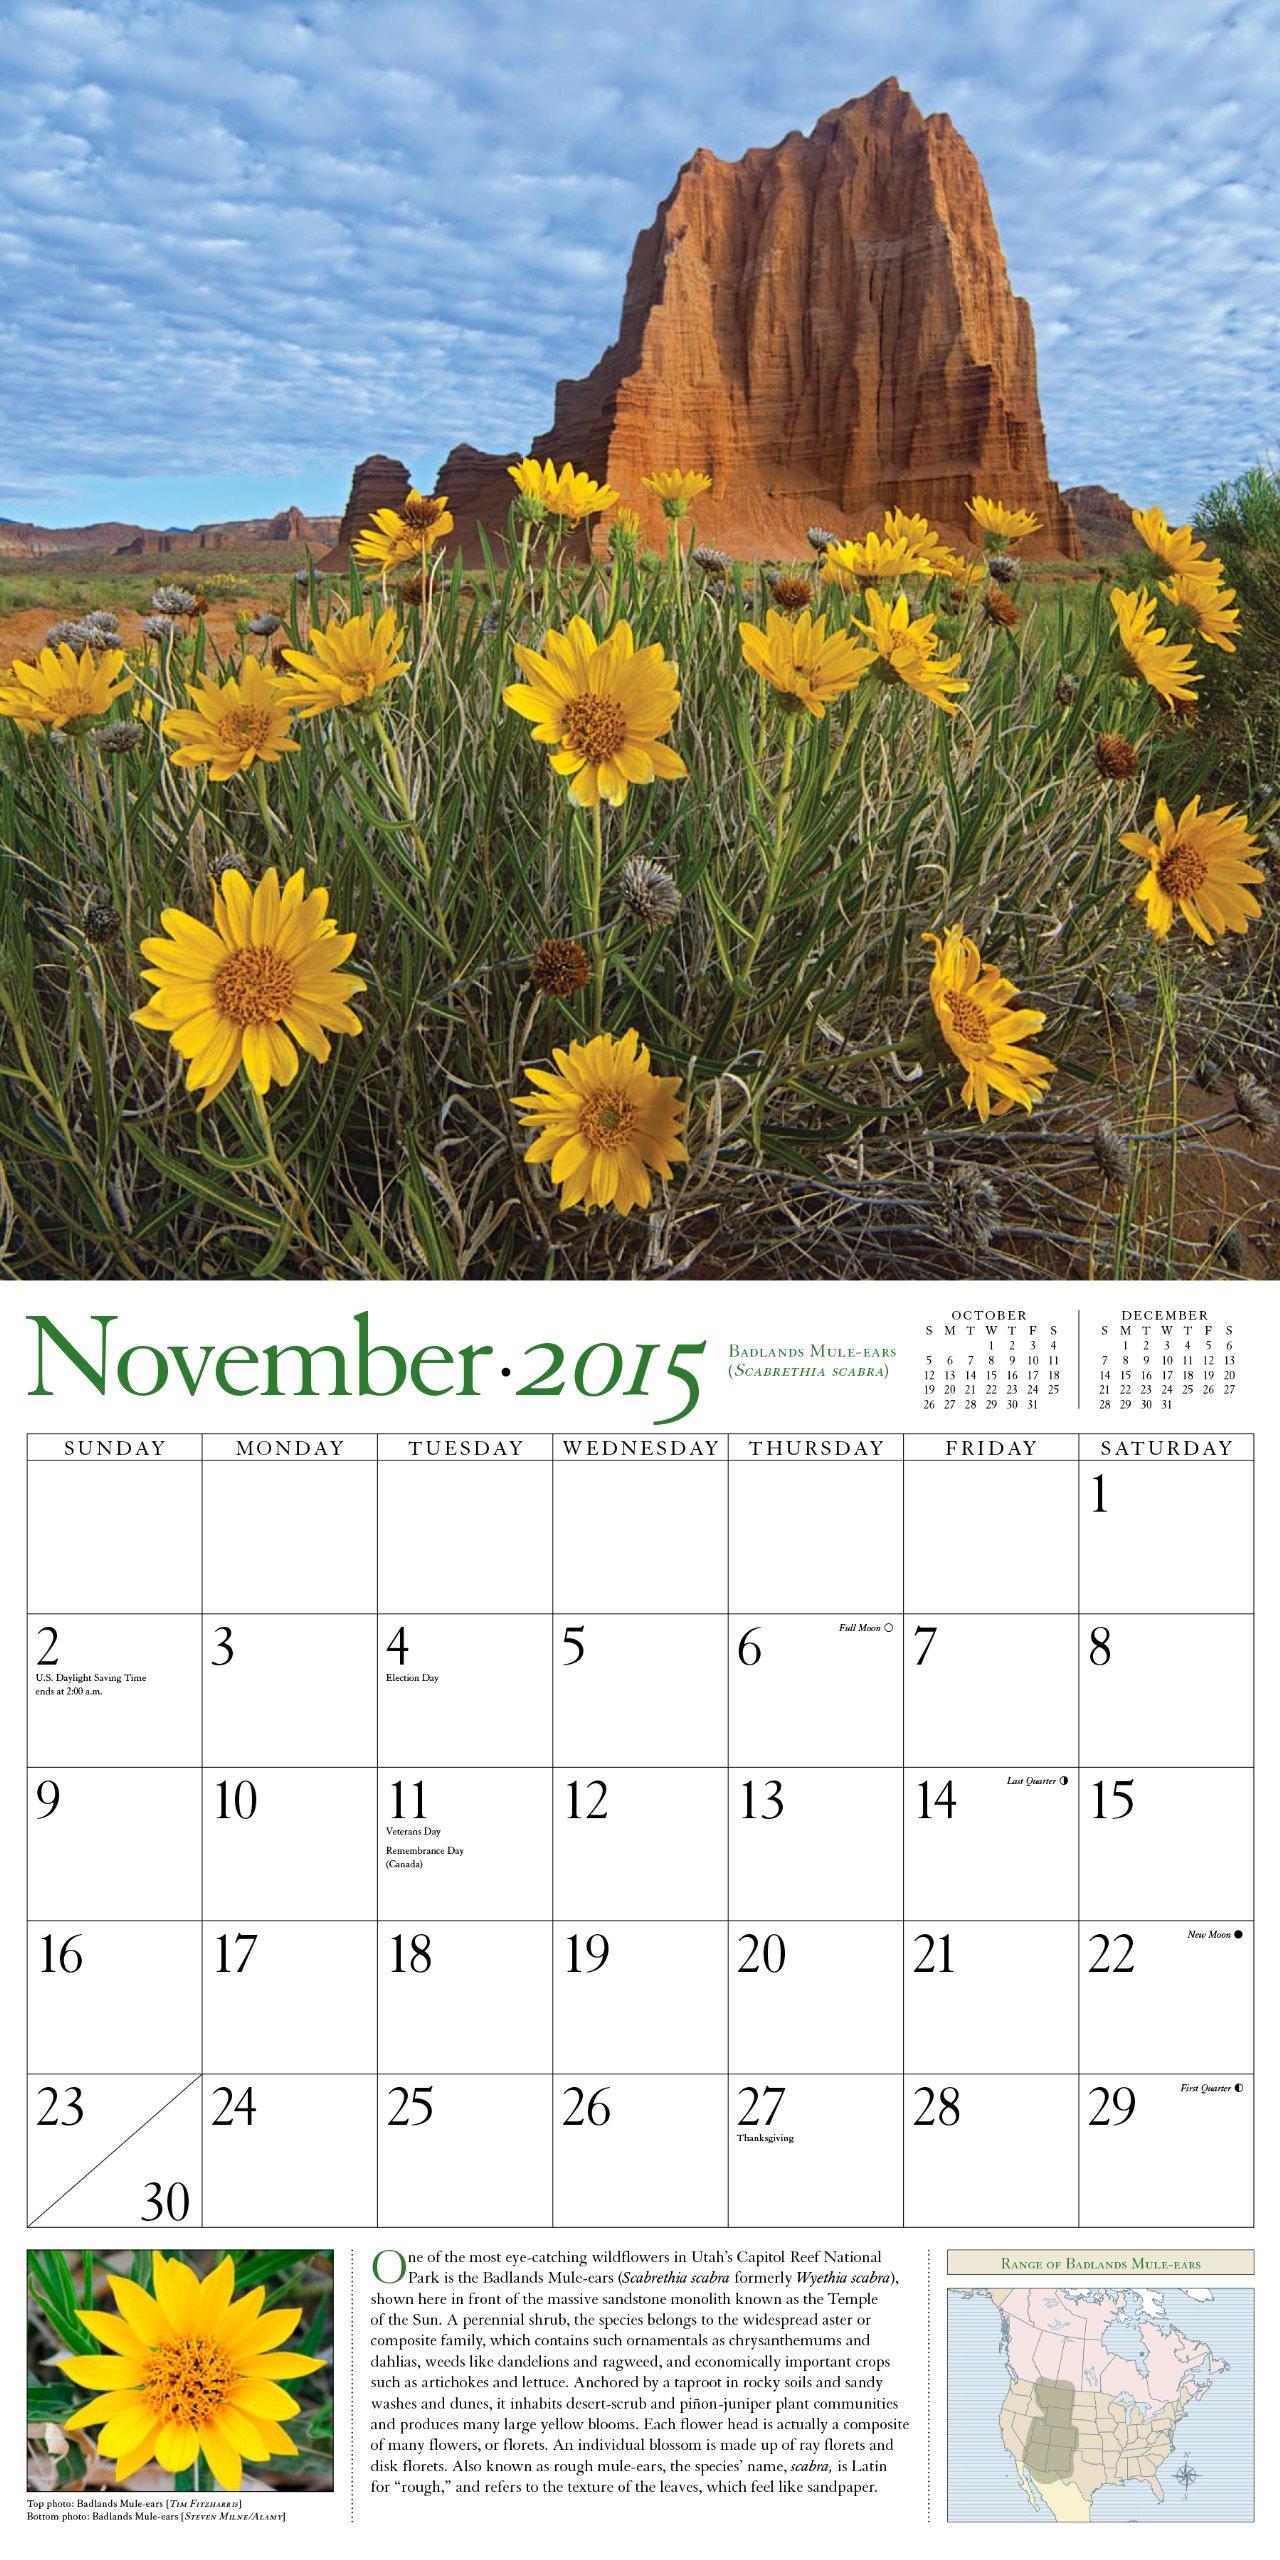 Audubon Wildflowers Calendar 2015: National Audubon Society: 9781579655754:  Amazon.com: Books